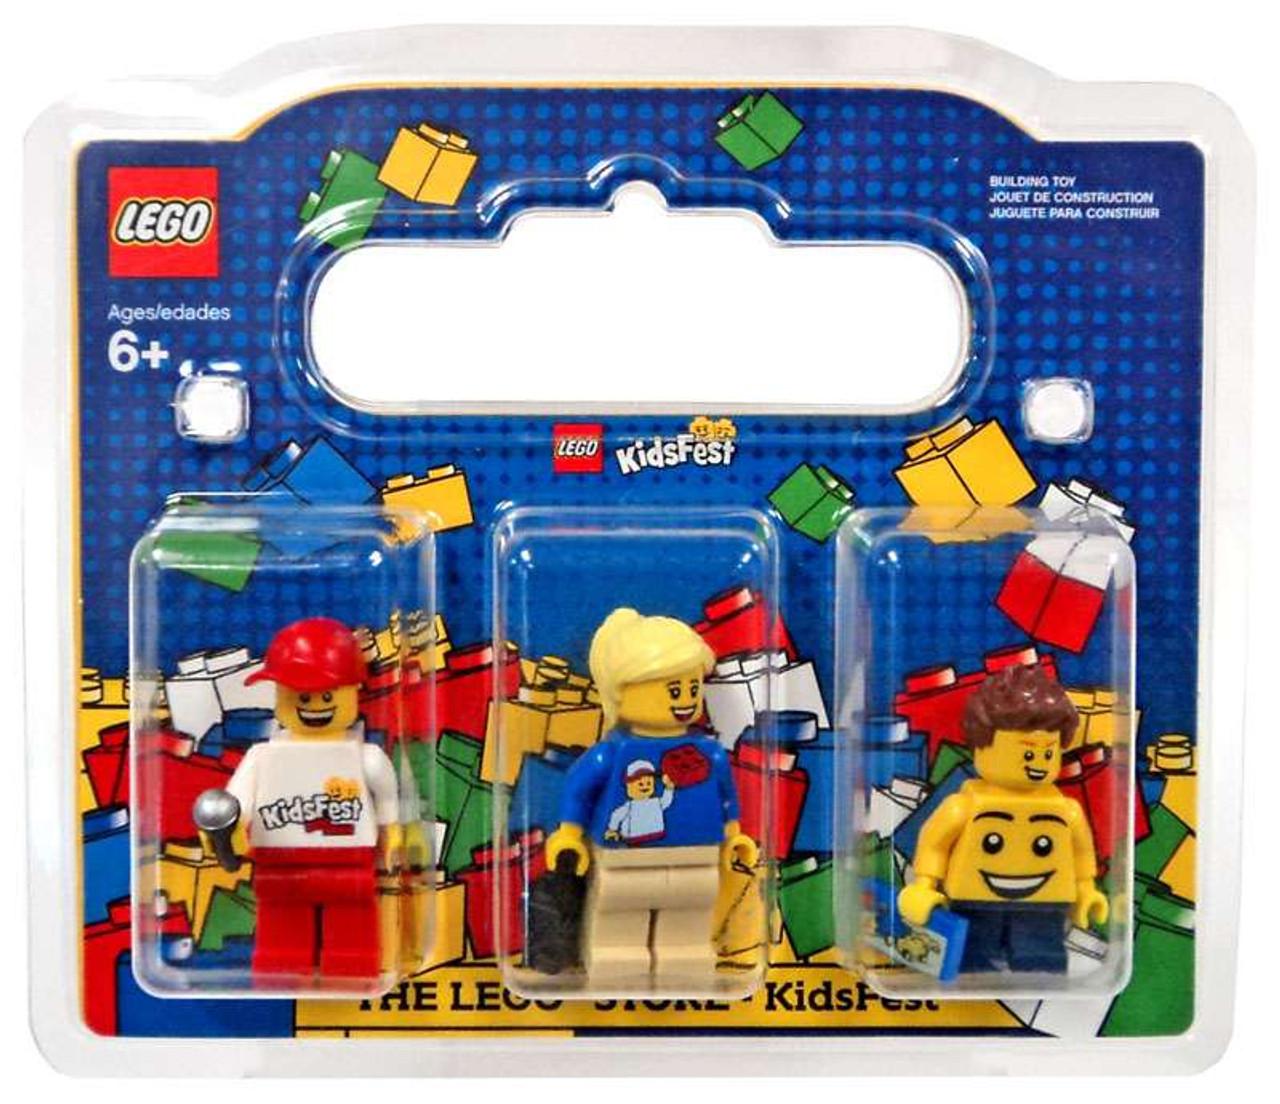 LEGO Store Kidsfest Exclusive Mini Figure 3-Pack #852766